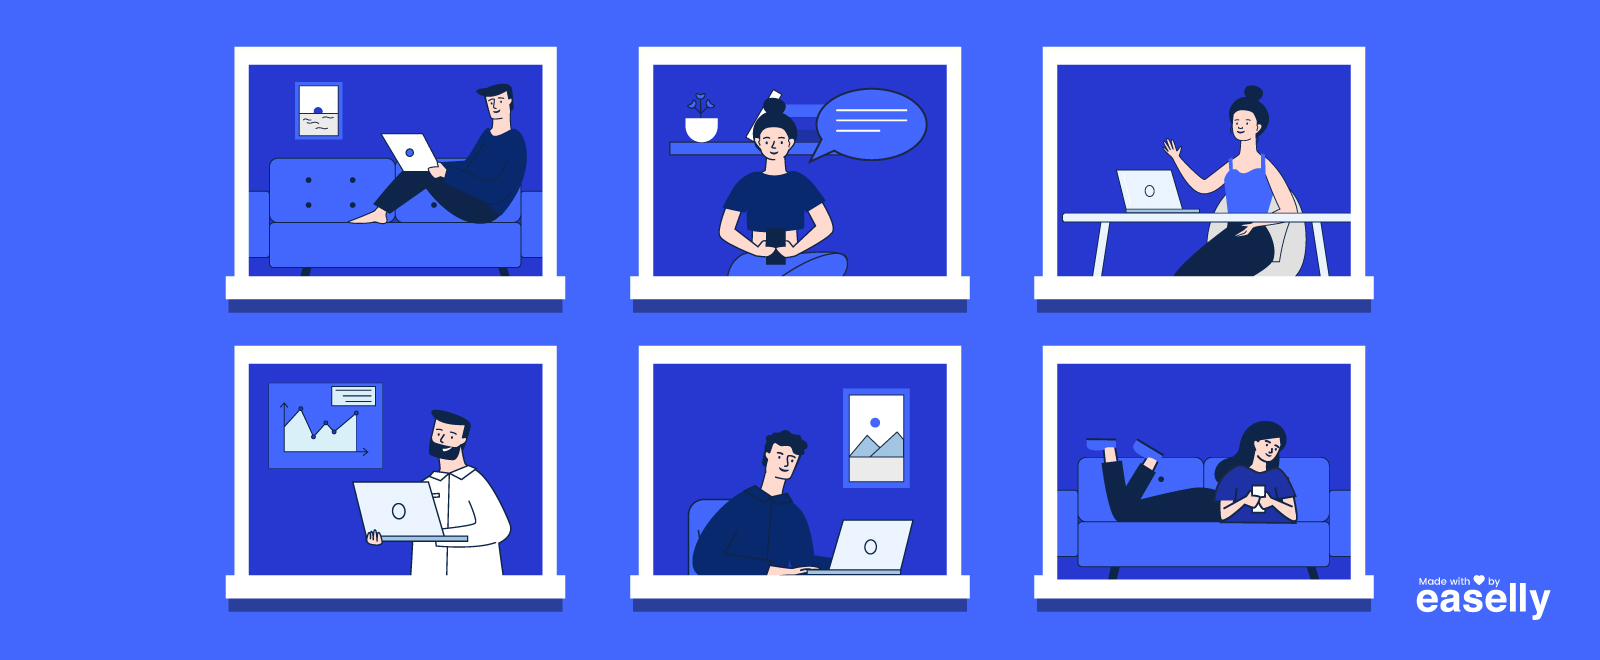 an illustration where entrepreneurs are doing creative marketing